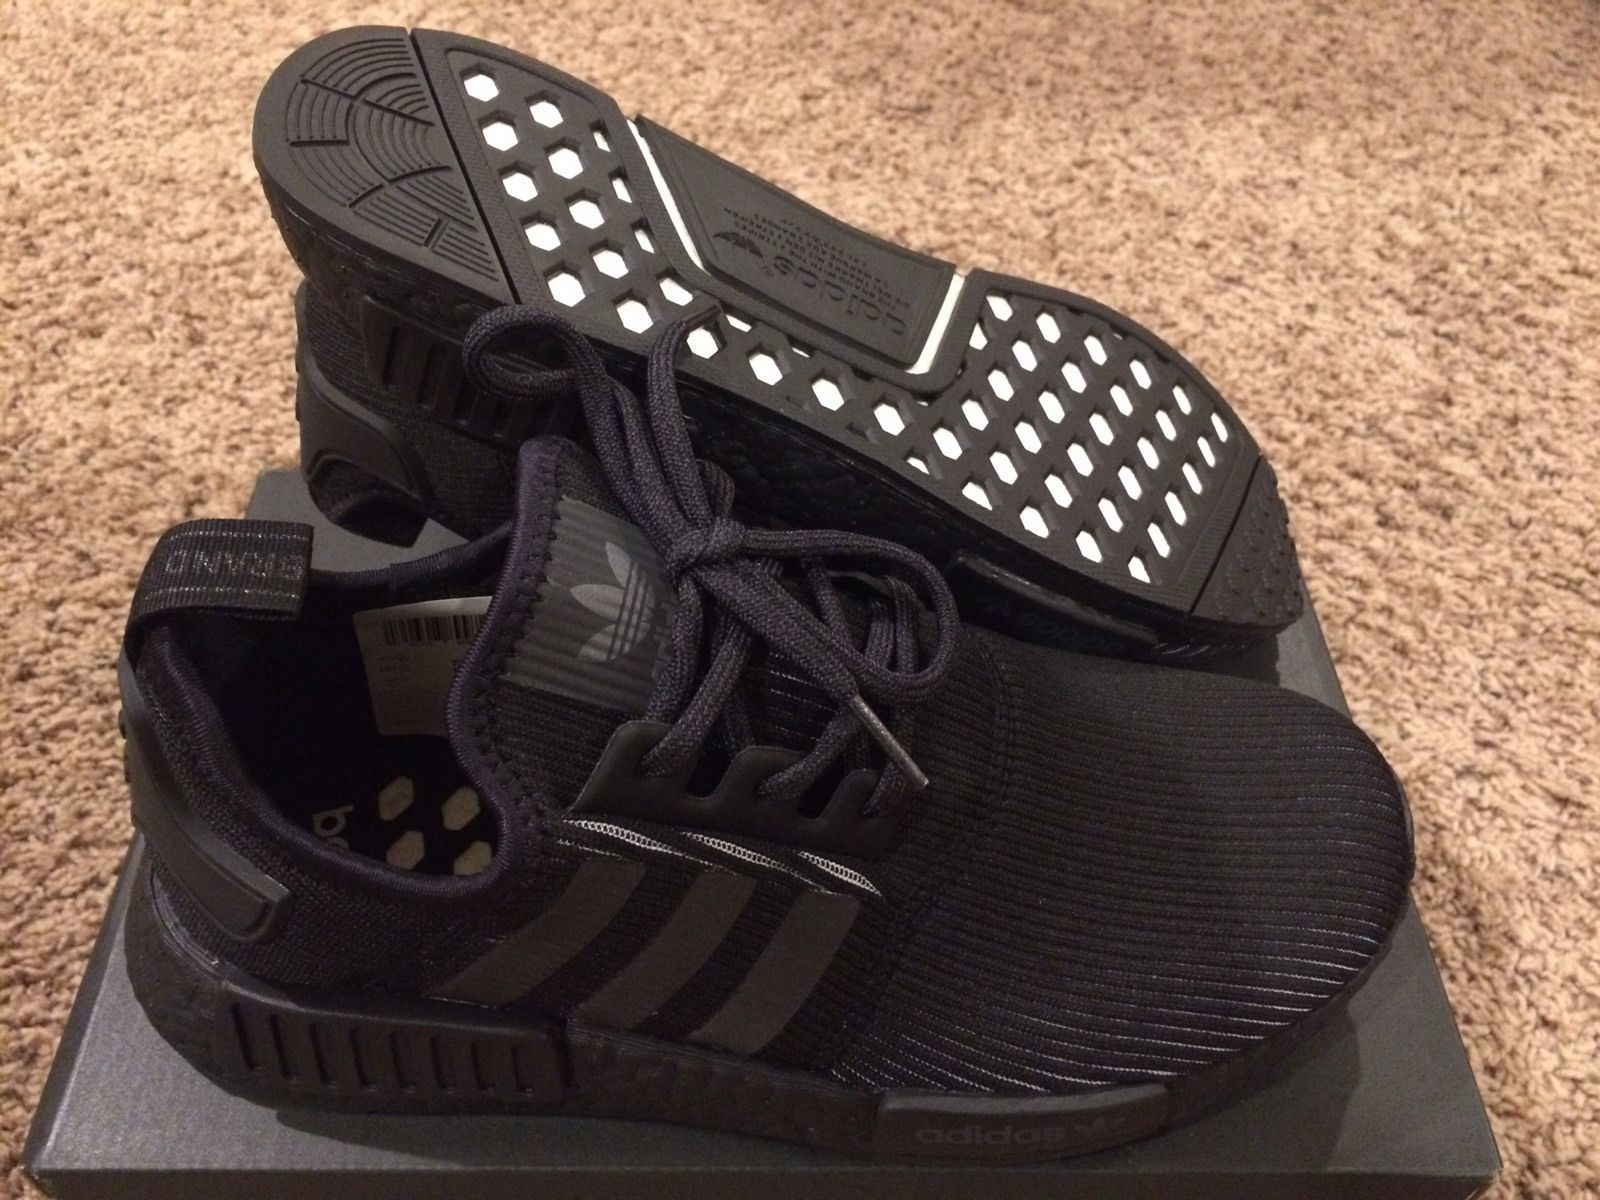 3f72a4e30901 Adidas Mens NMD R1 Size  7.5 Triple Black 3m Reflective BNIB Dead Stock